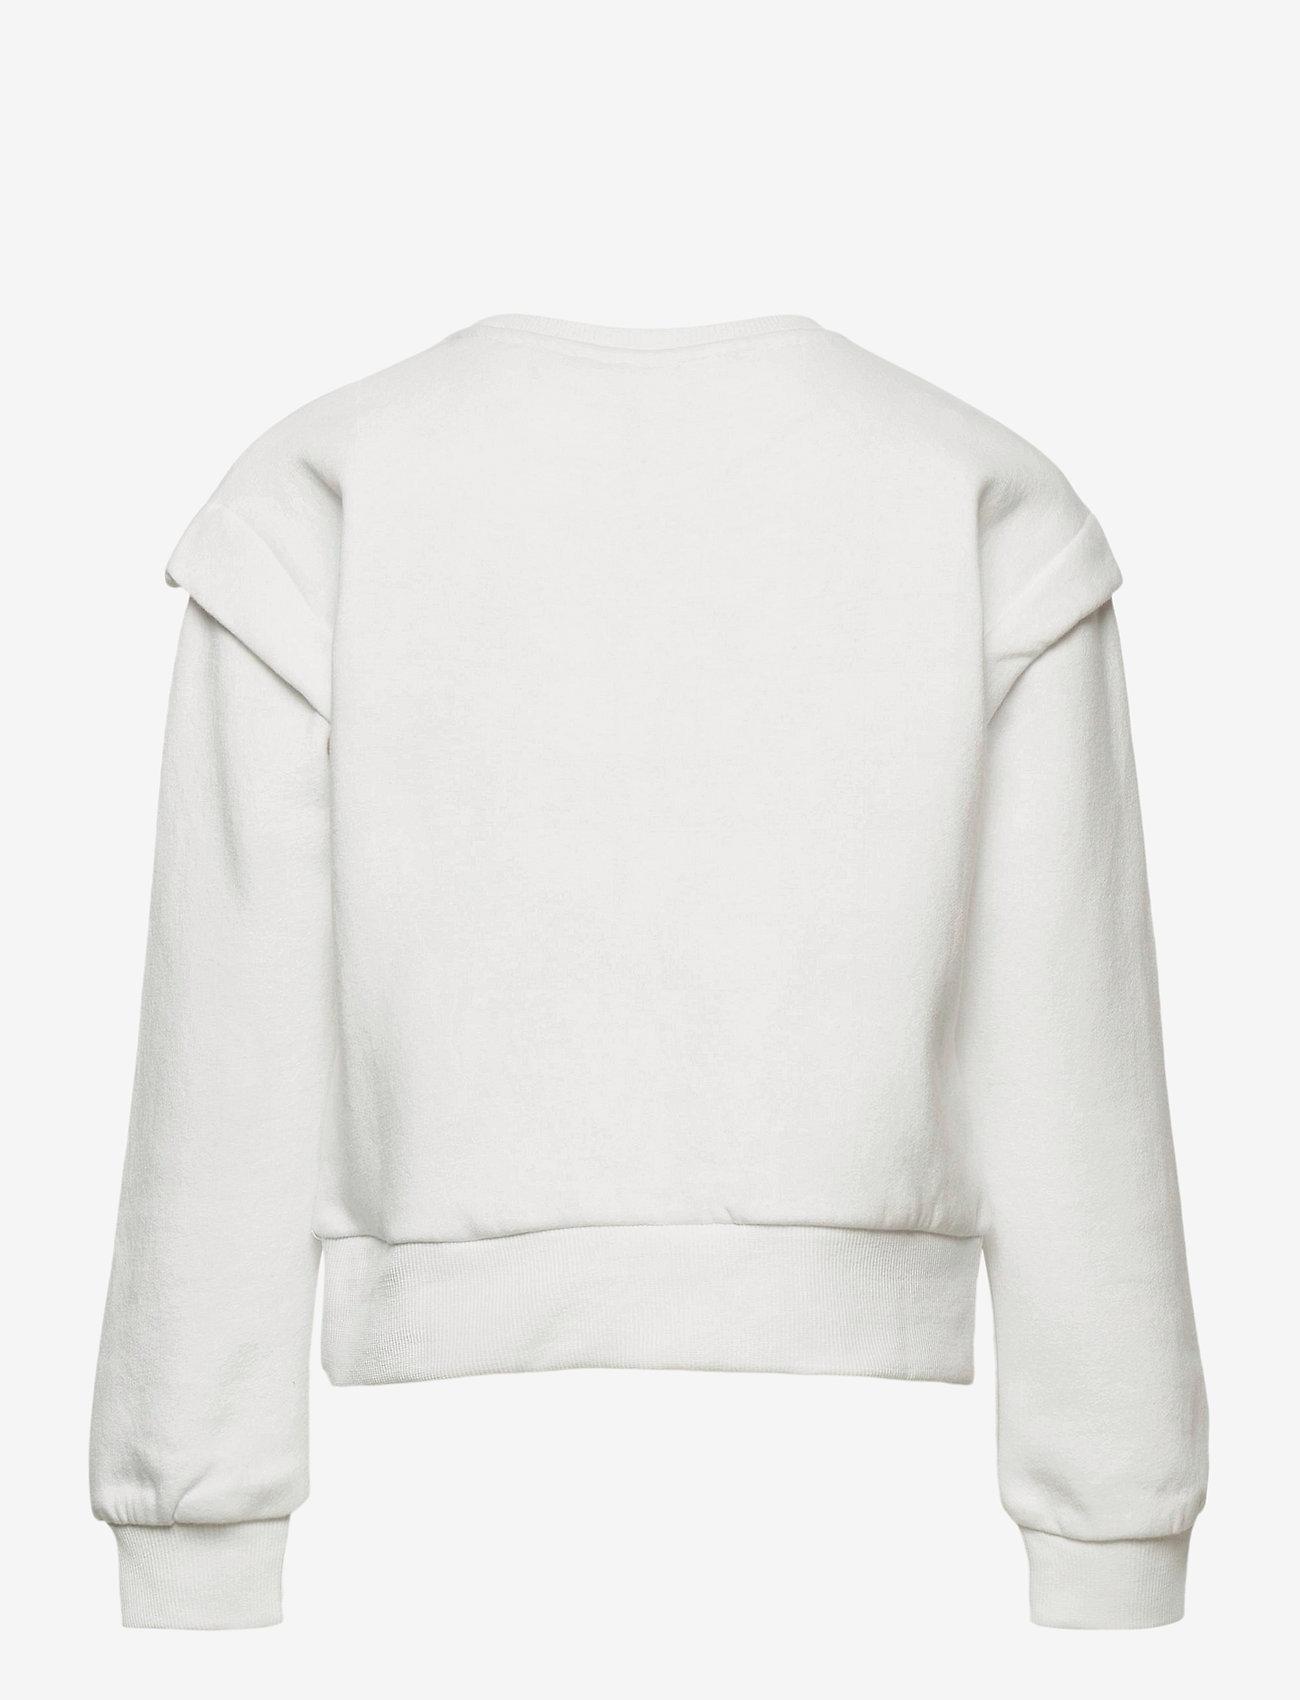 Kids Only - KONELLA L/S O-NECK SWT - sweatshirts - bright white - 1